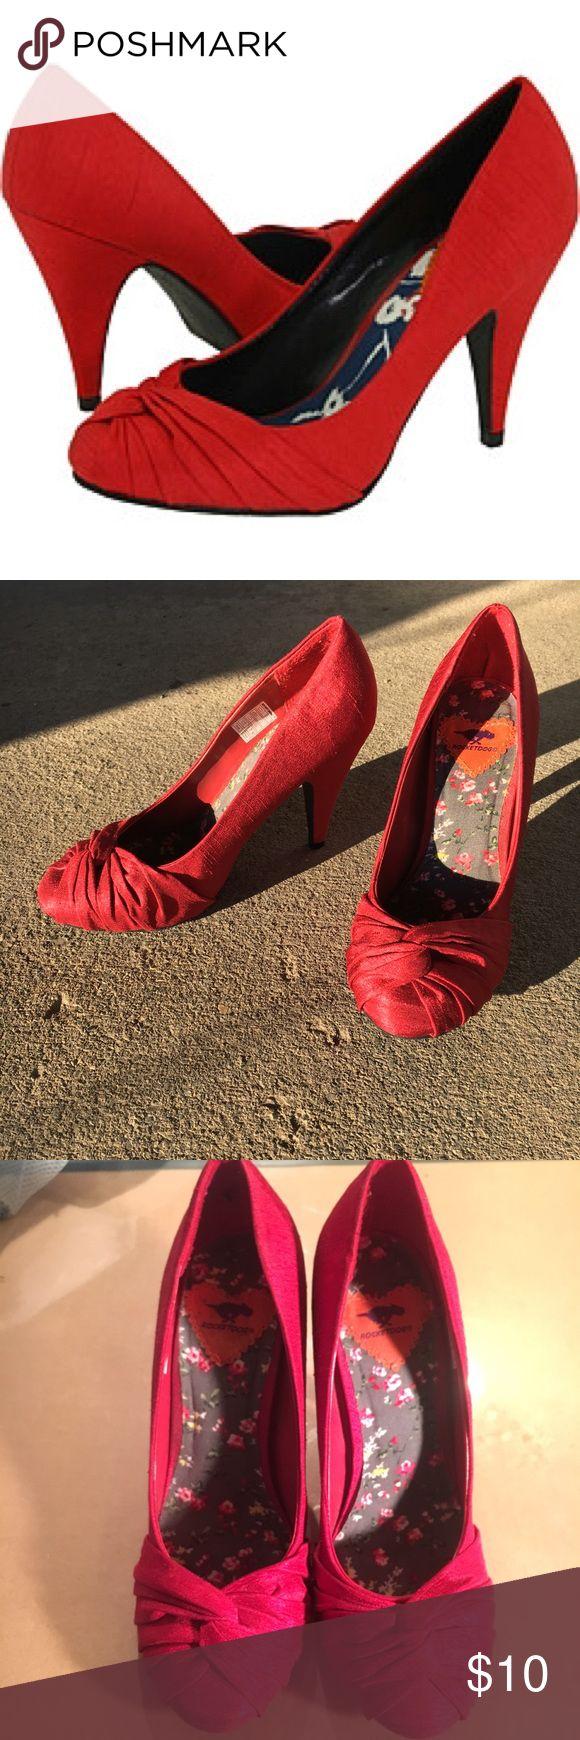 Rocket dog red heels Excellent condition, only worn once! Red Rocket dog heels, 4 inch heel. Fabric twist design Rocket Dog Shoes Heels